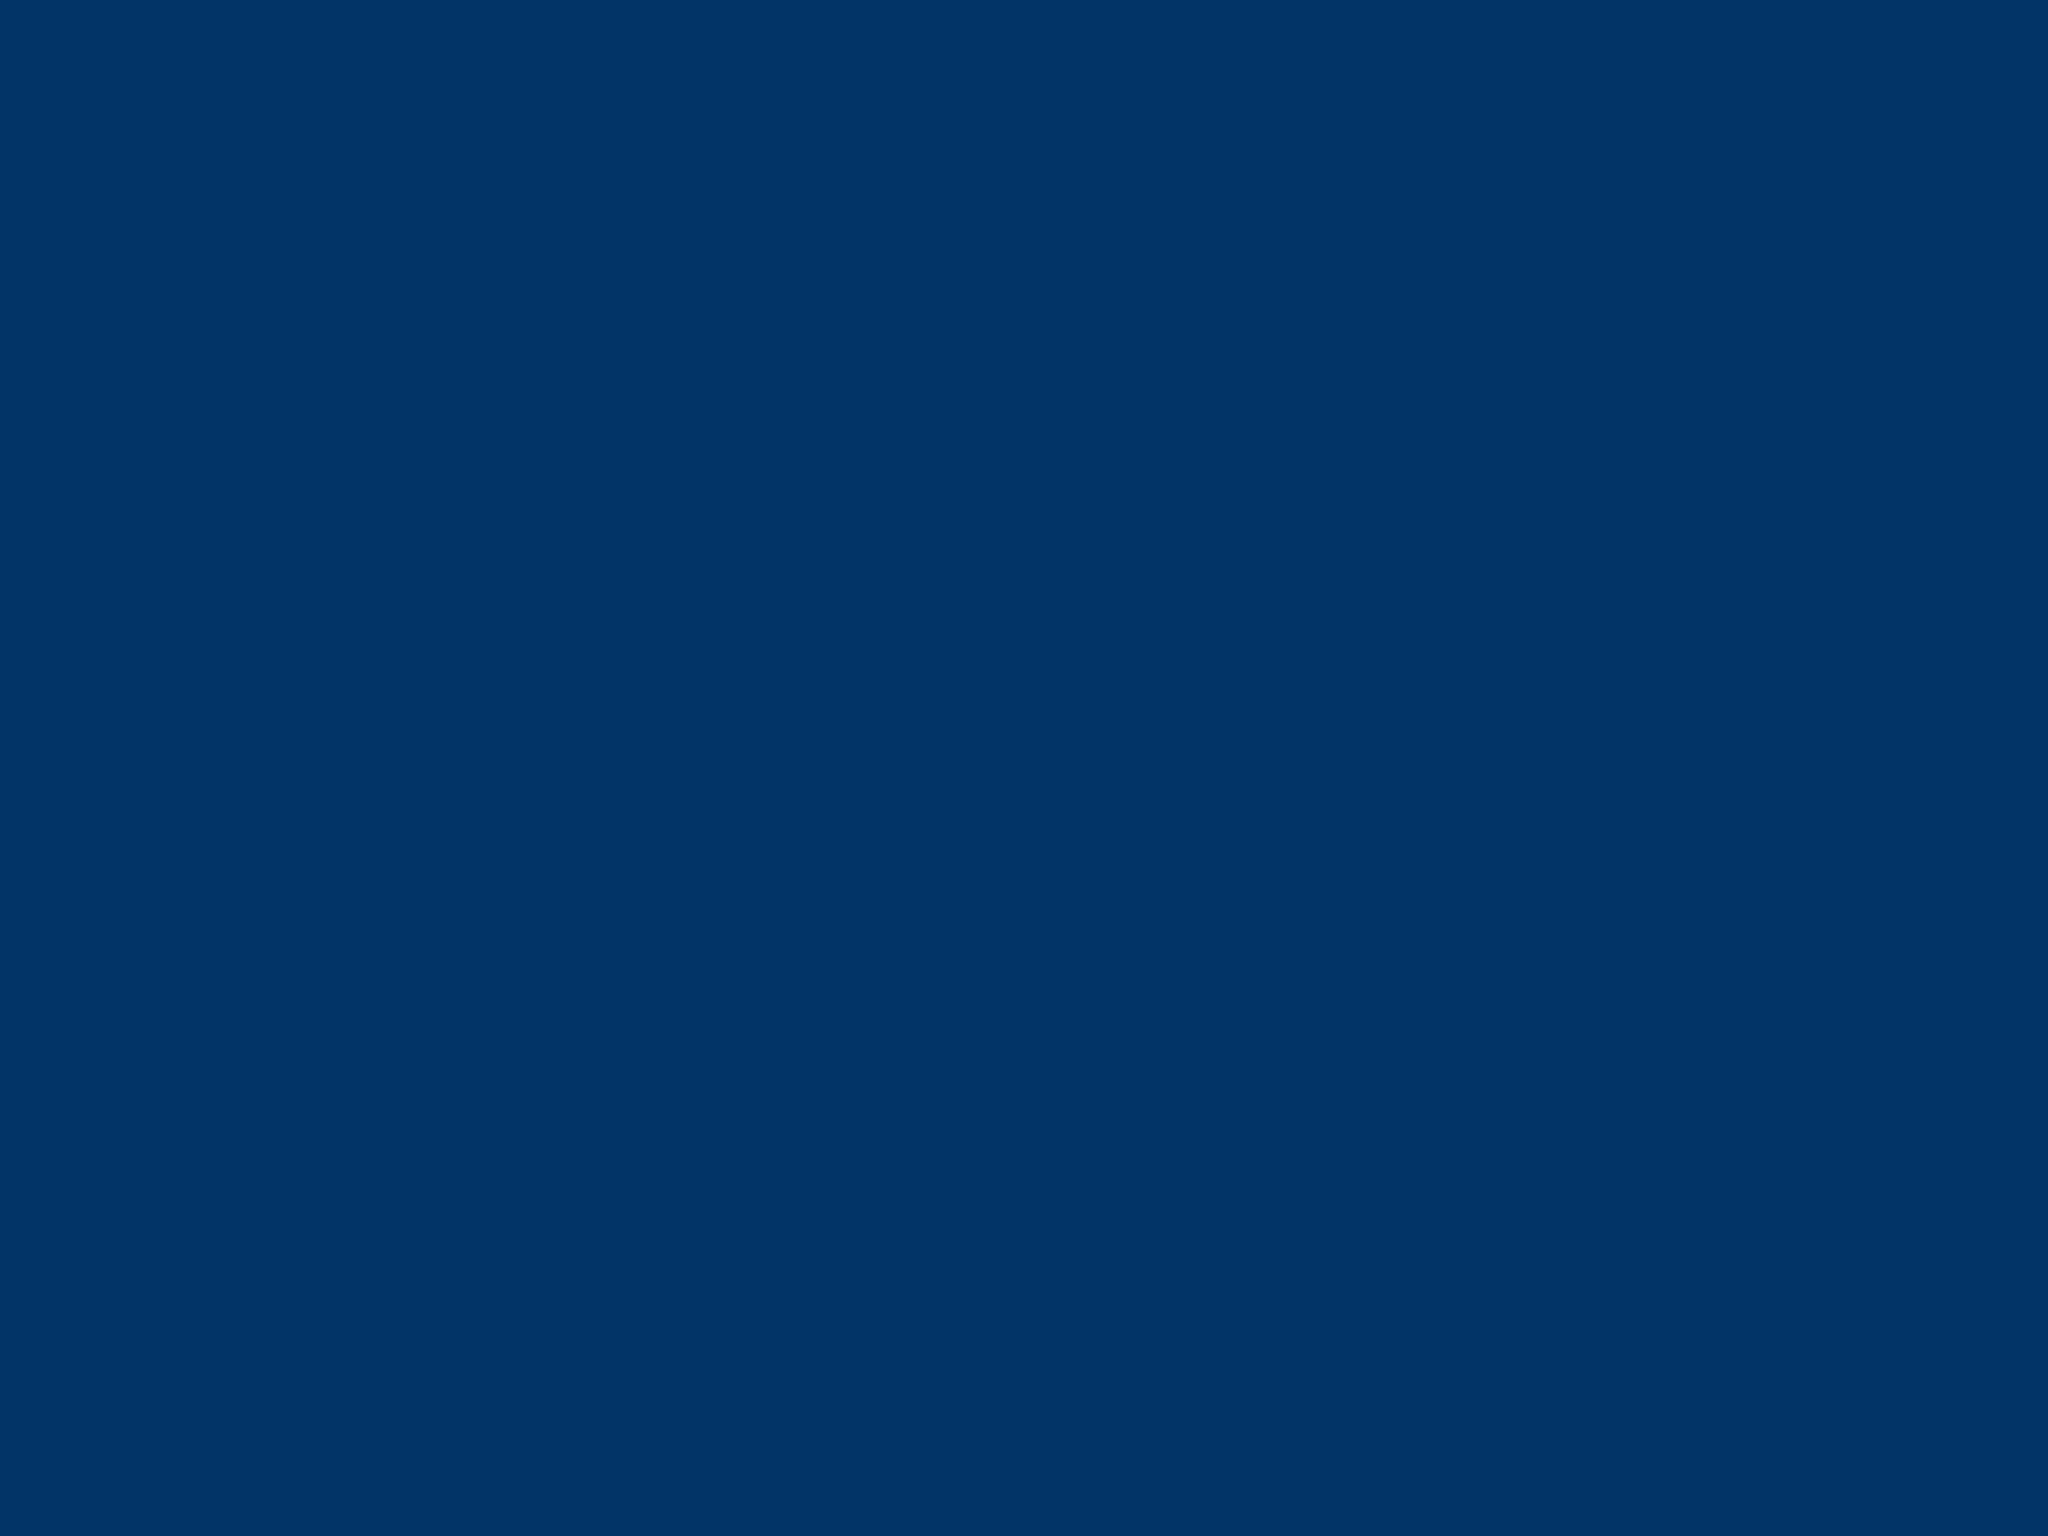 2048x1536 Dark Midnight Blue Solid Color Background